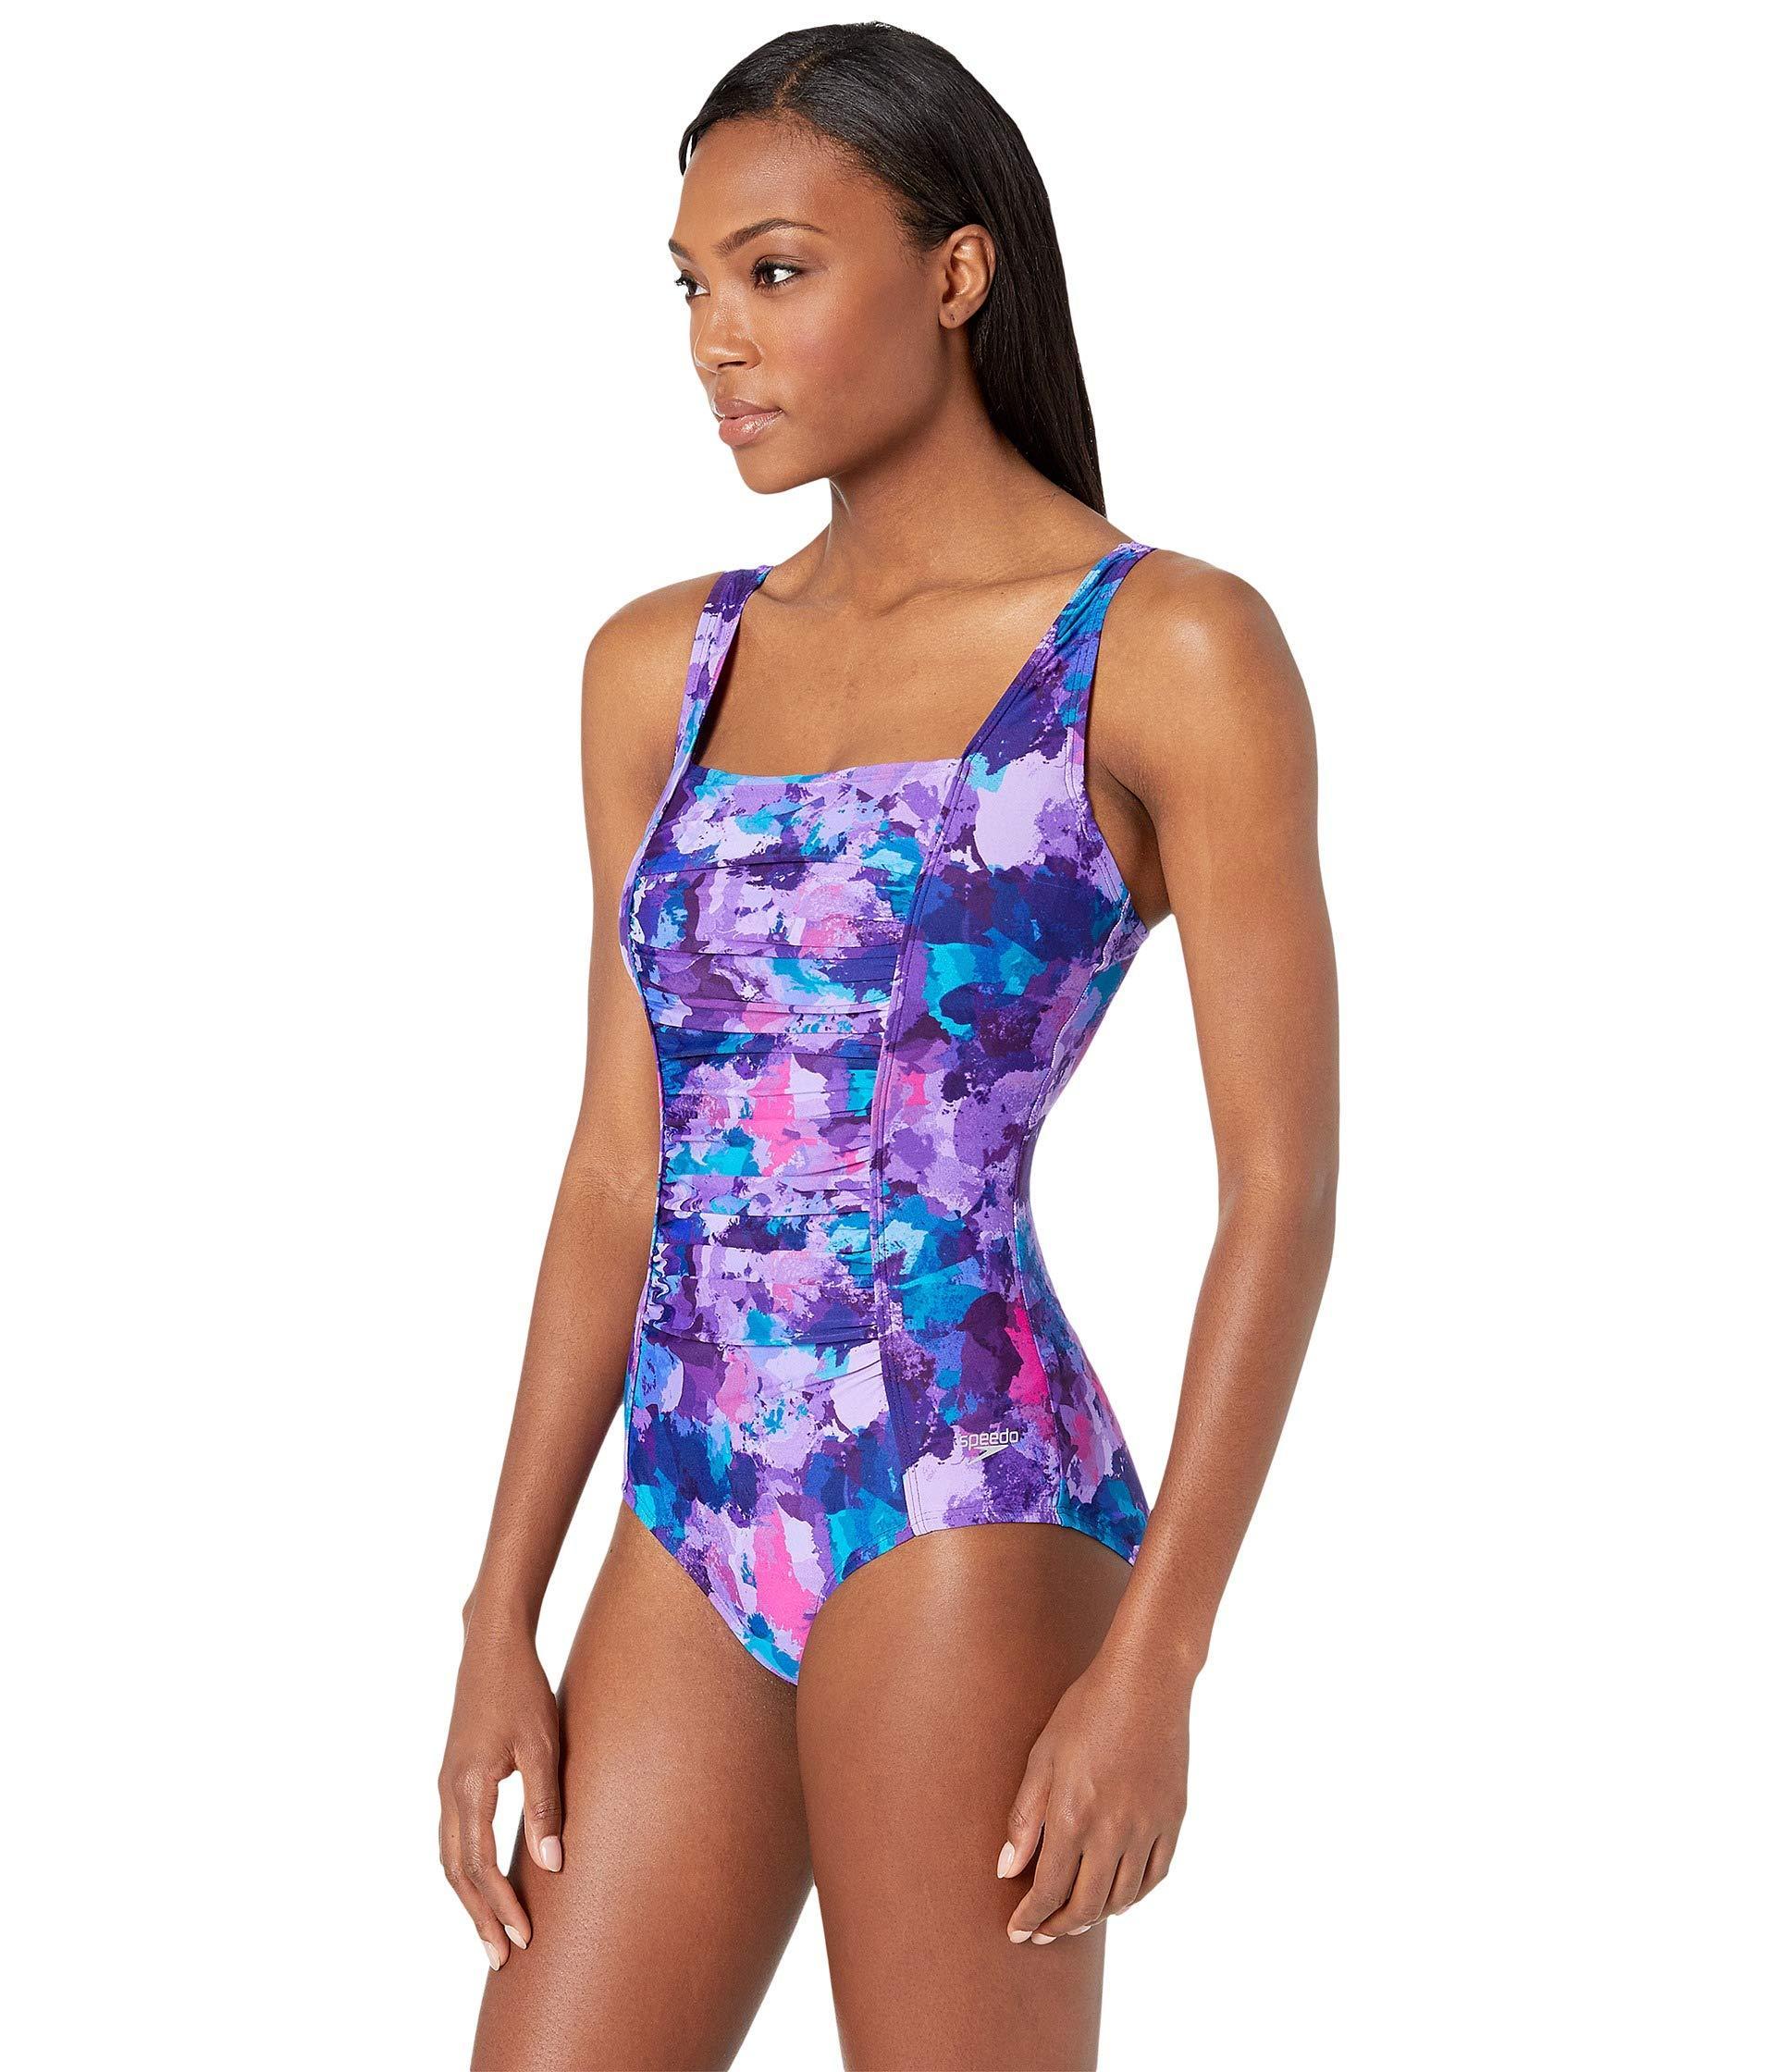 084faf94d8db7 Speedo Endurance Plus Shirred Tank Swimsuit (multi) Women's ...